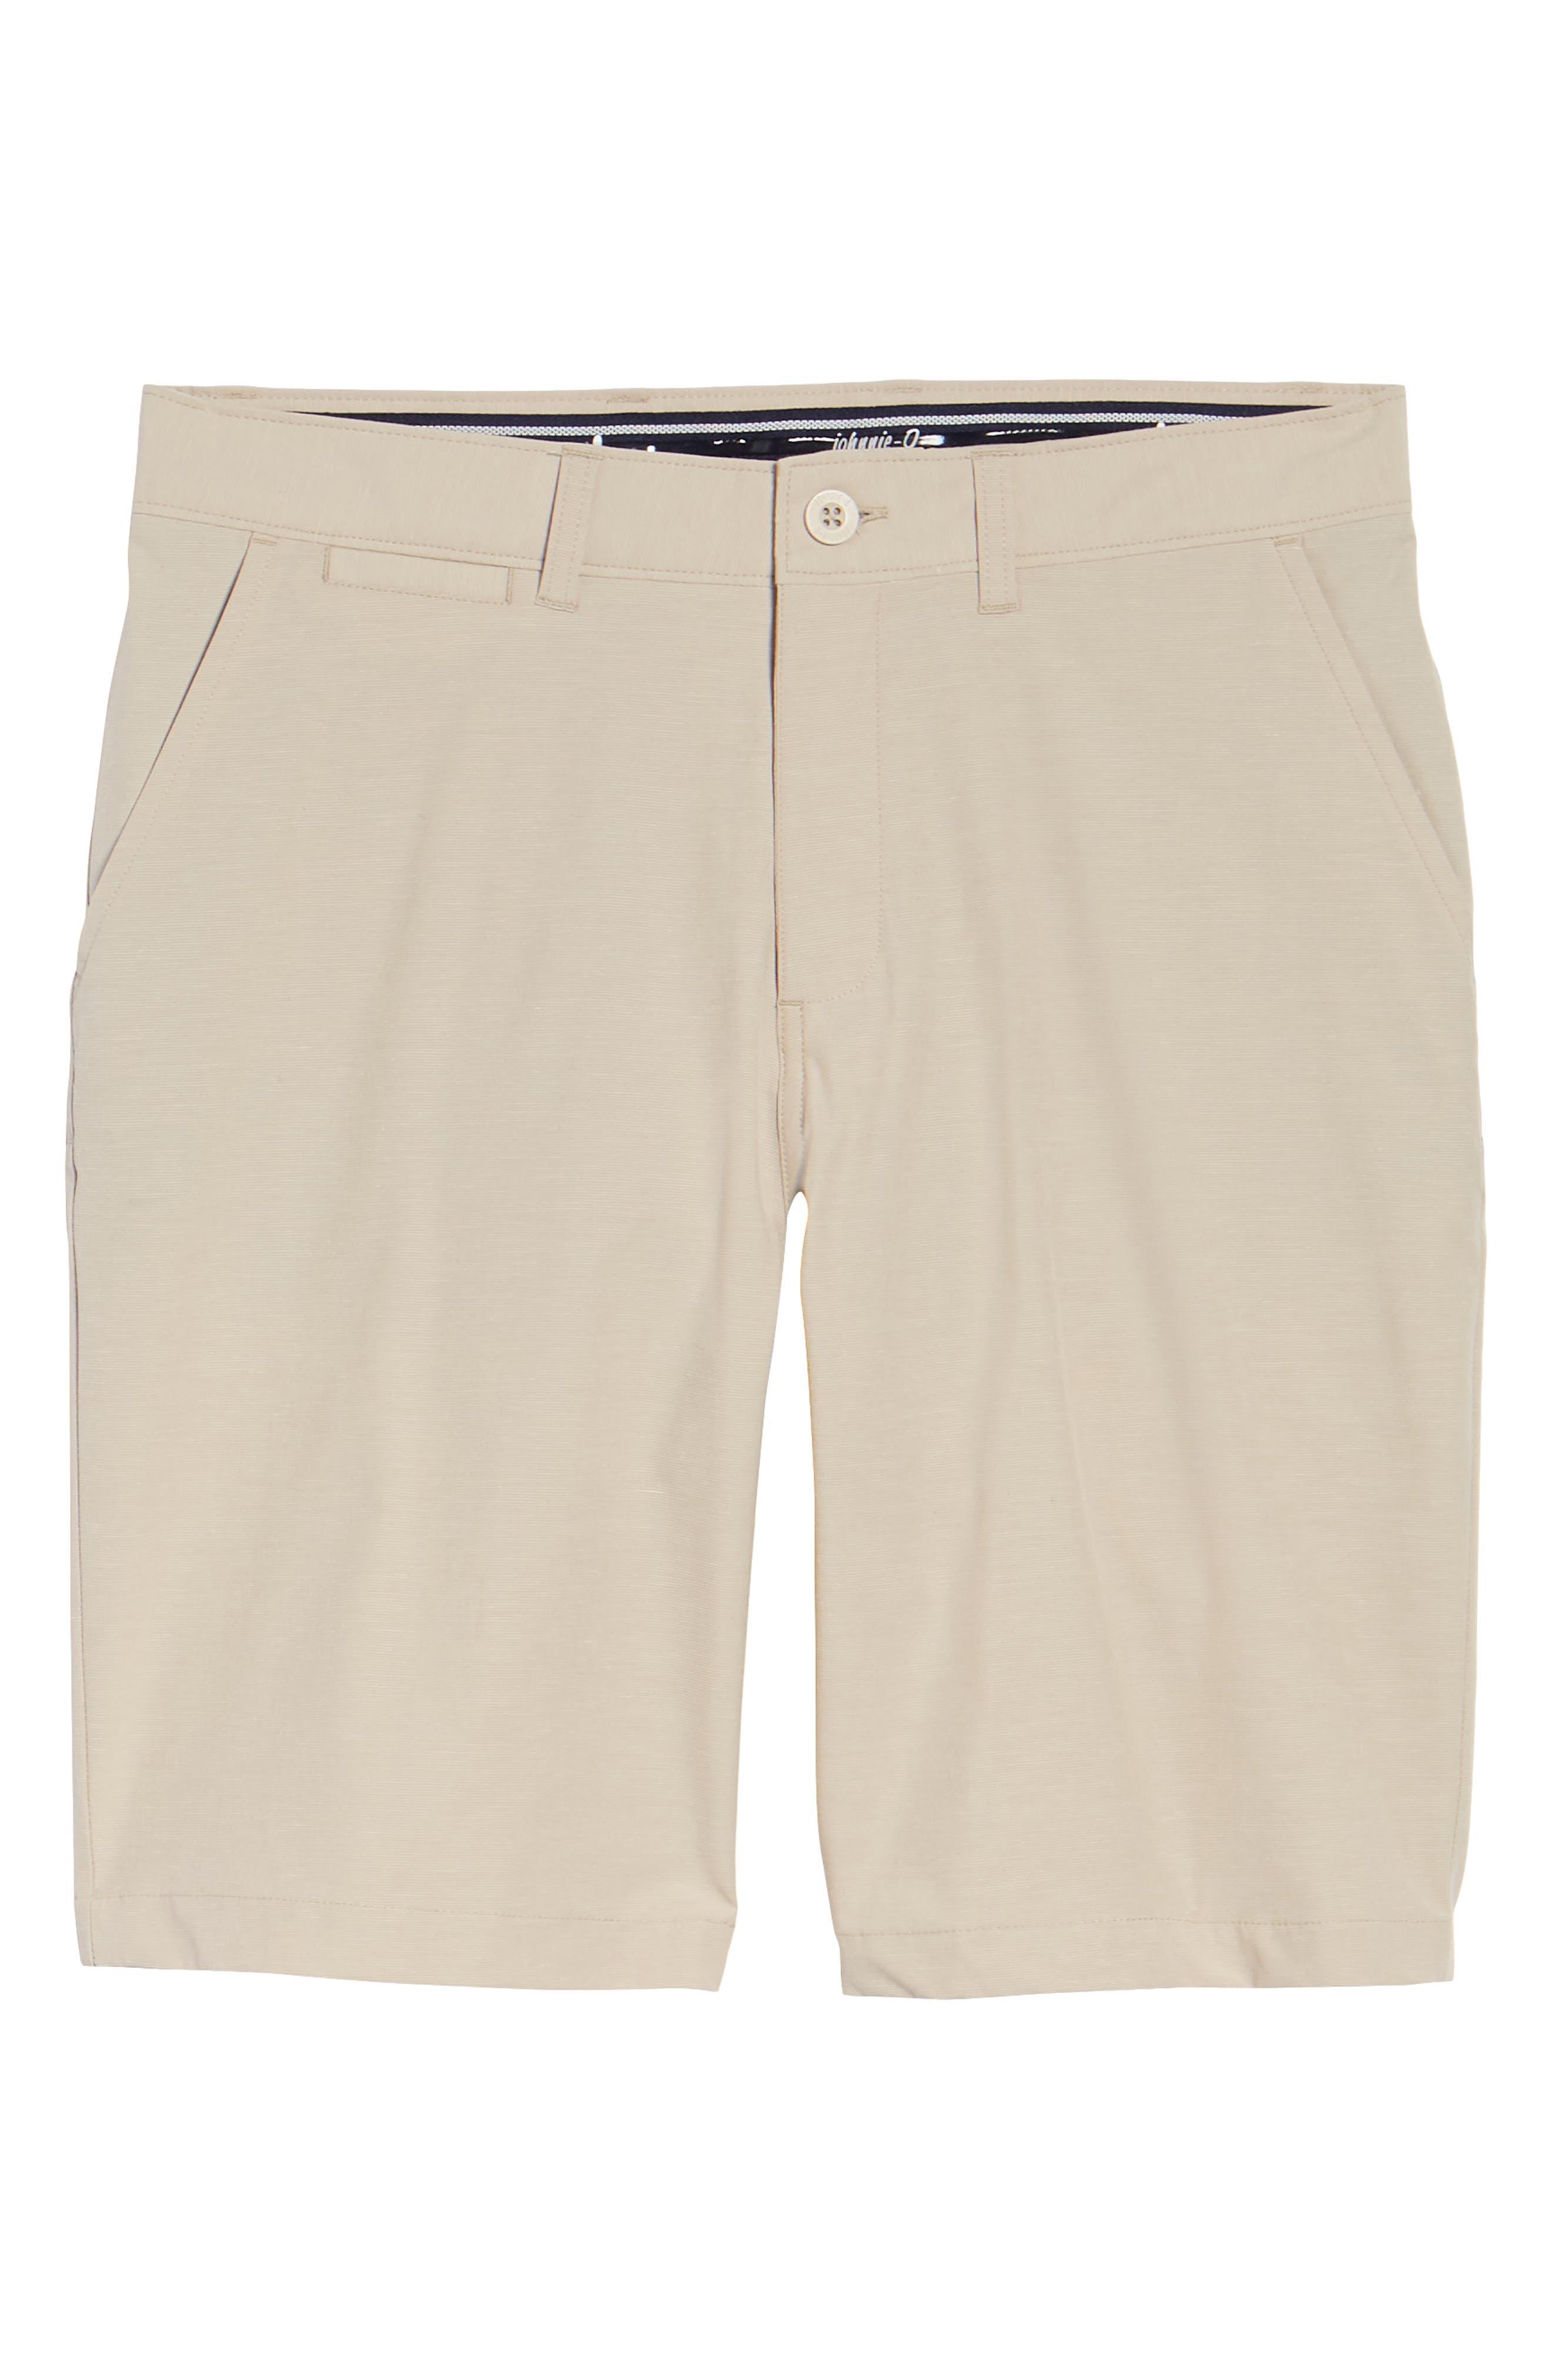 Wyatt Regular Fit Stretch Shorts,                             Alternate thumbnail 6, color,                             Stone